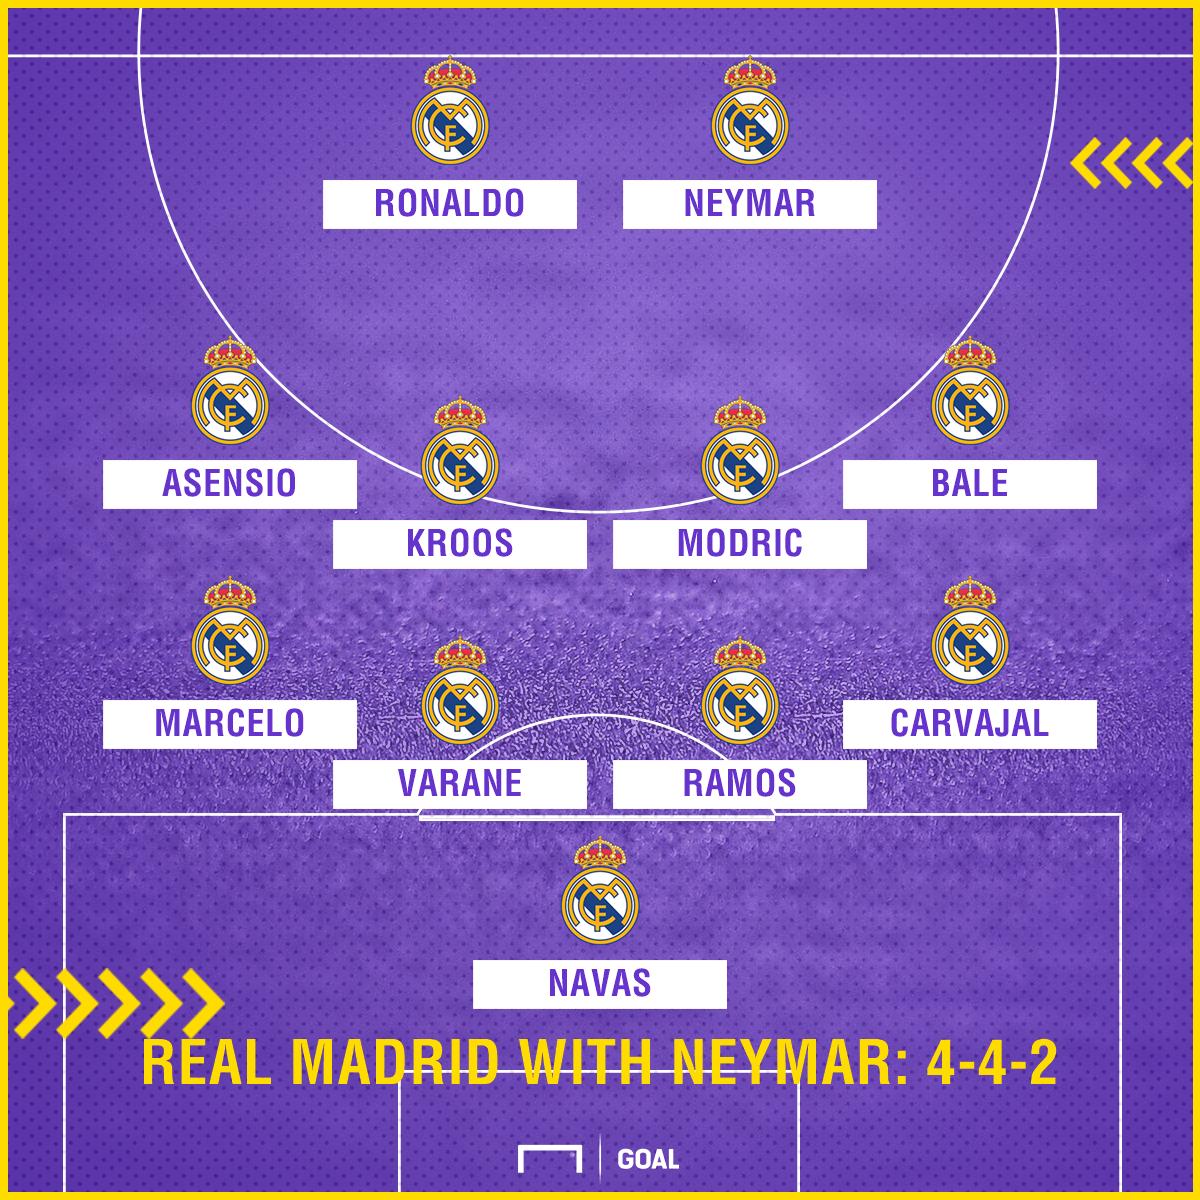 Real Madrid with Neymar 4-4-2